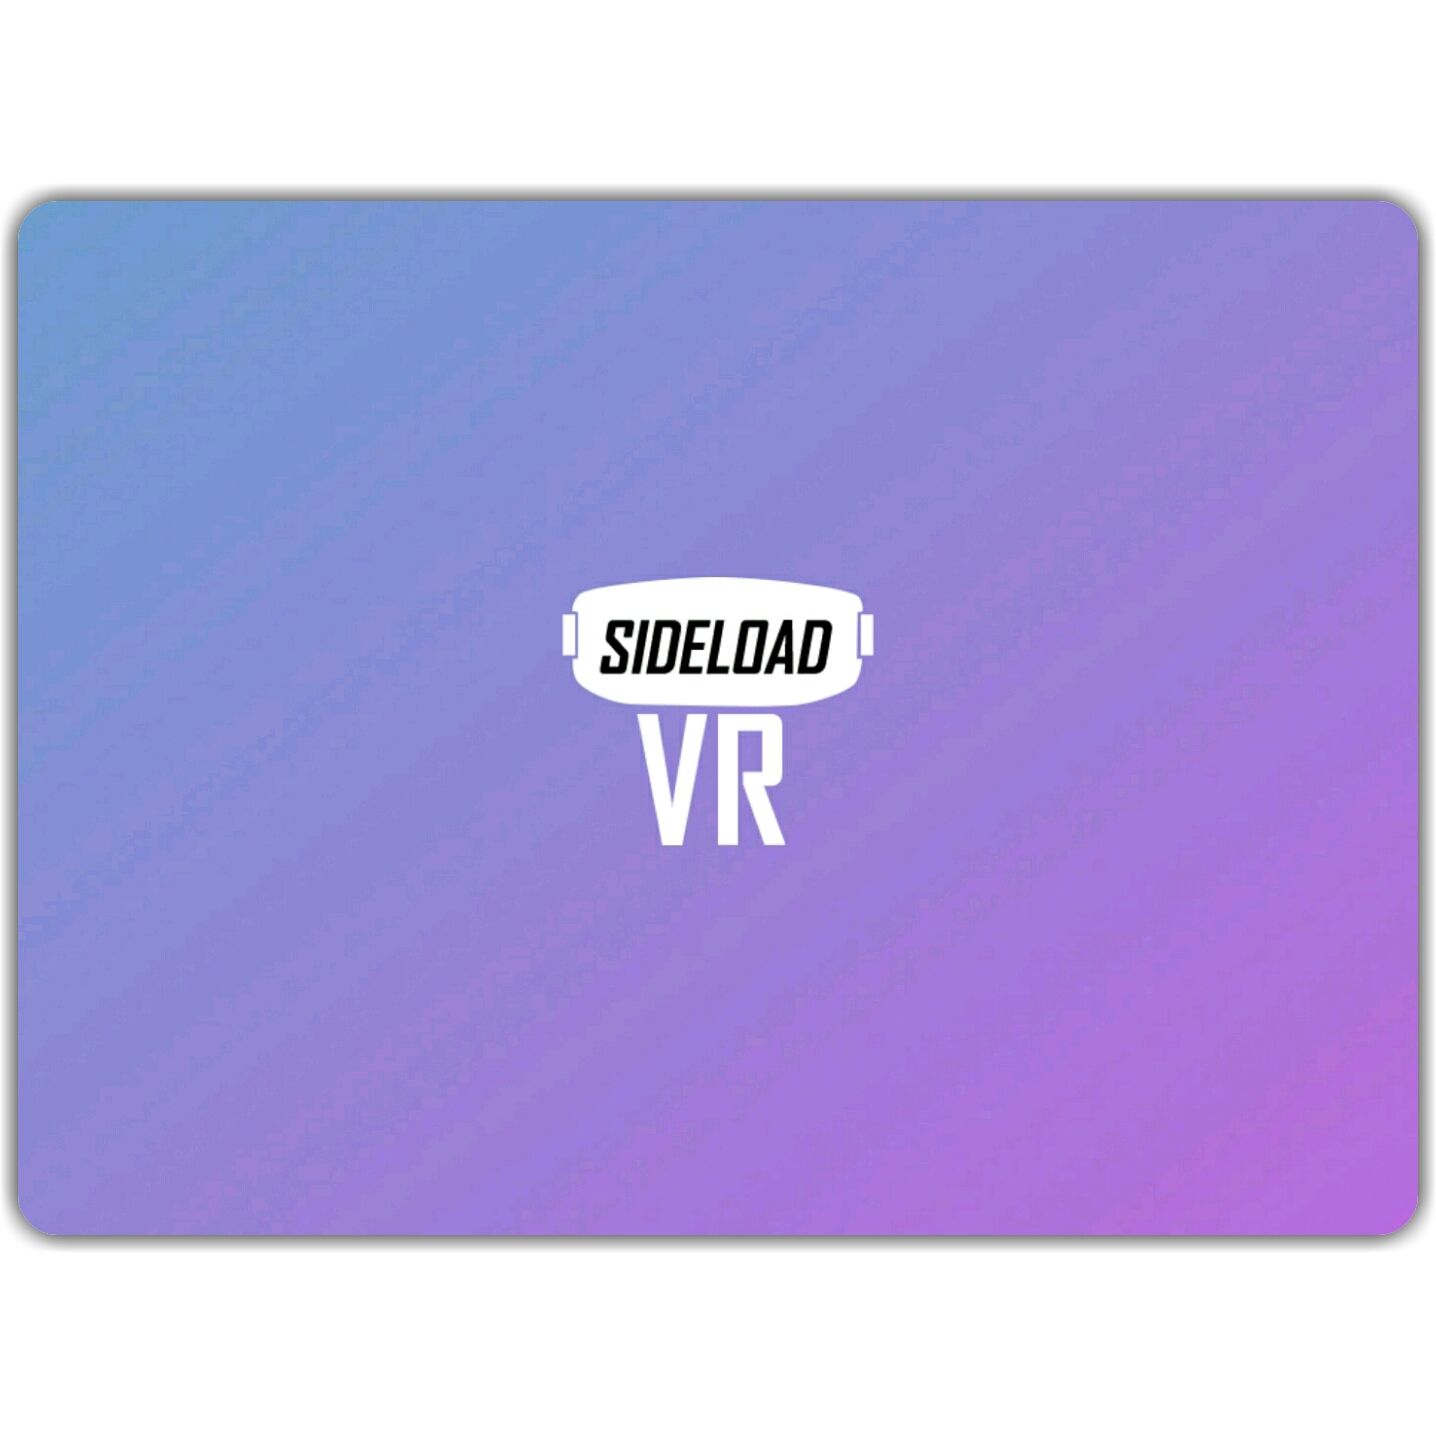 sideloadvr logo